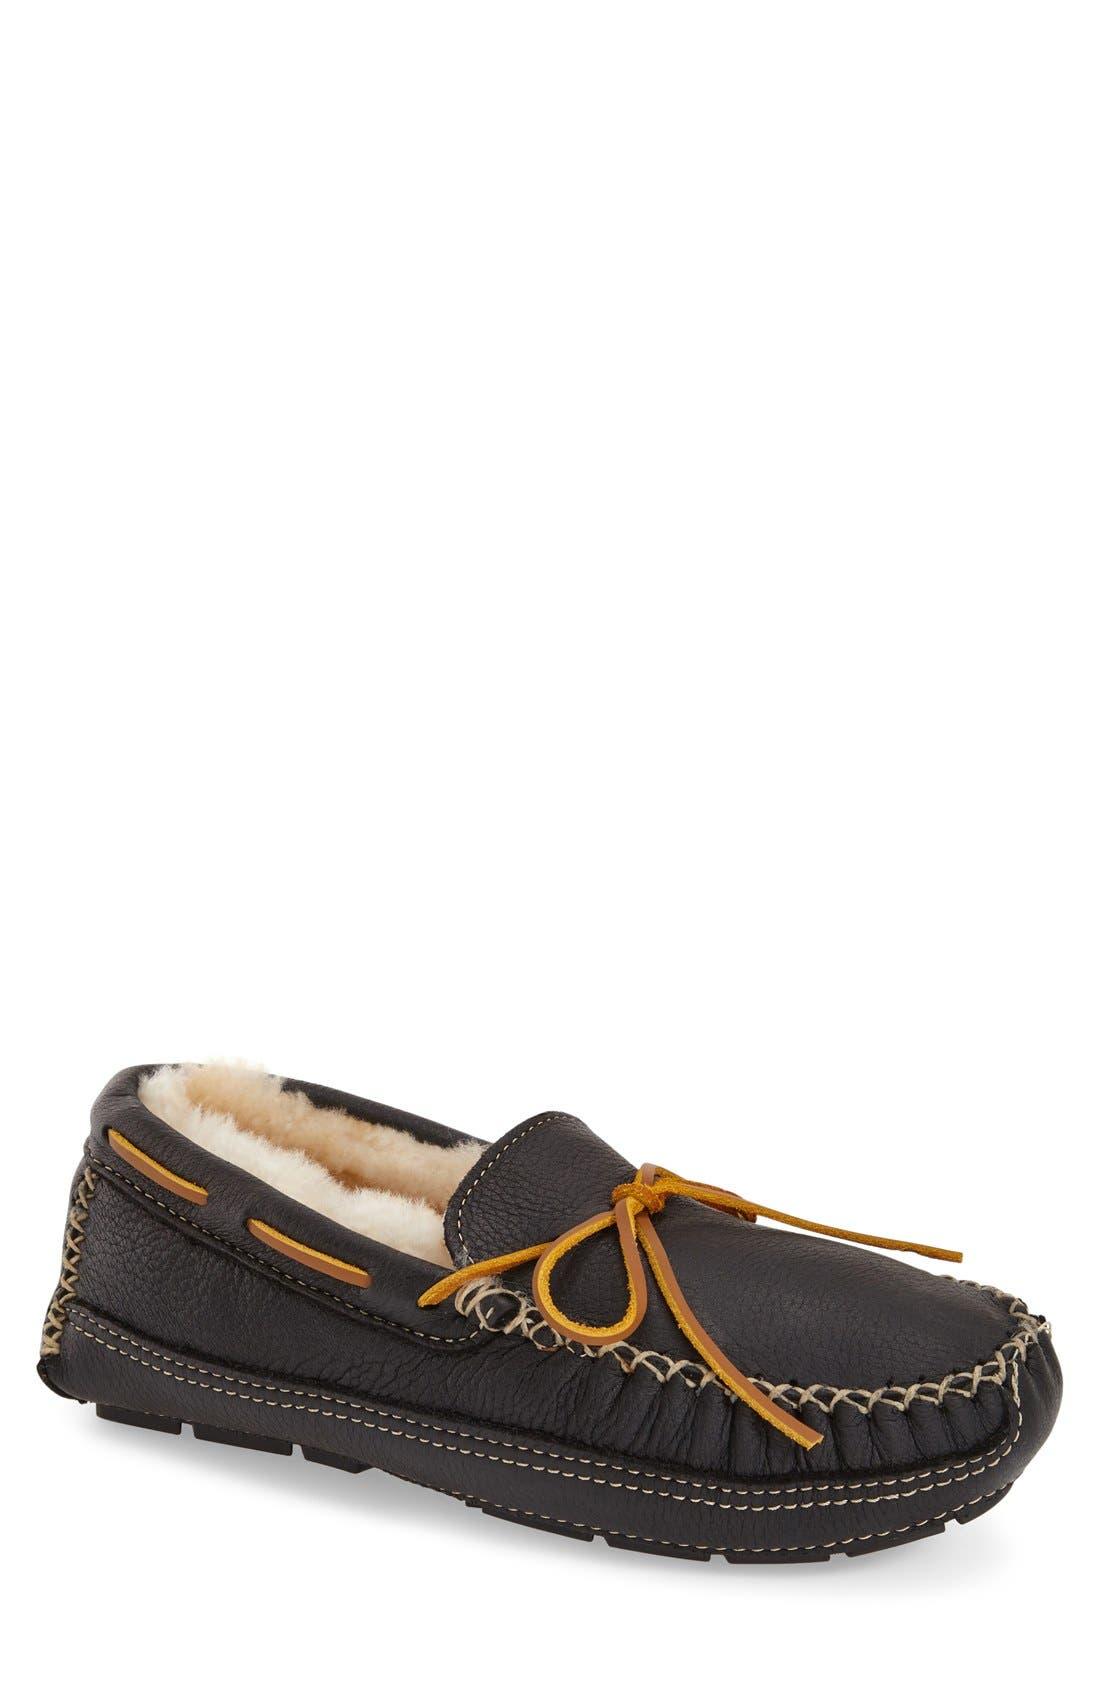 Minnetonka Genuine Shearling Leather Slipper (Men)